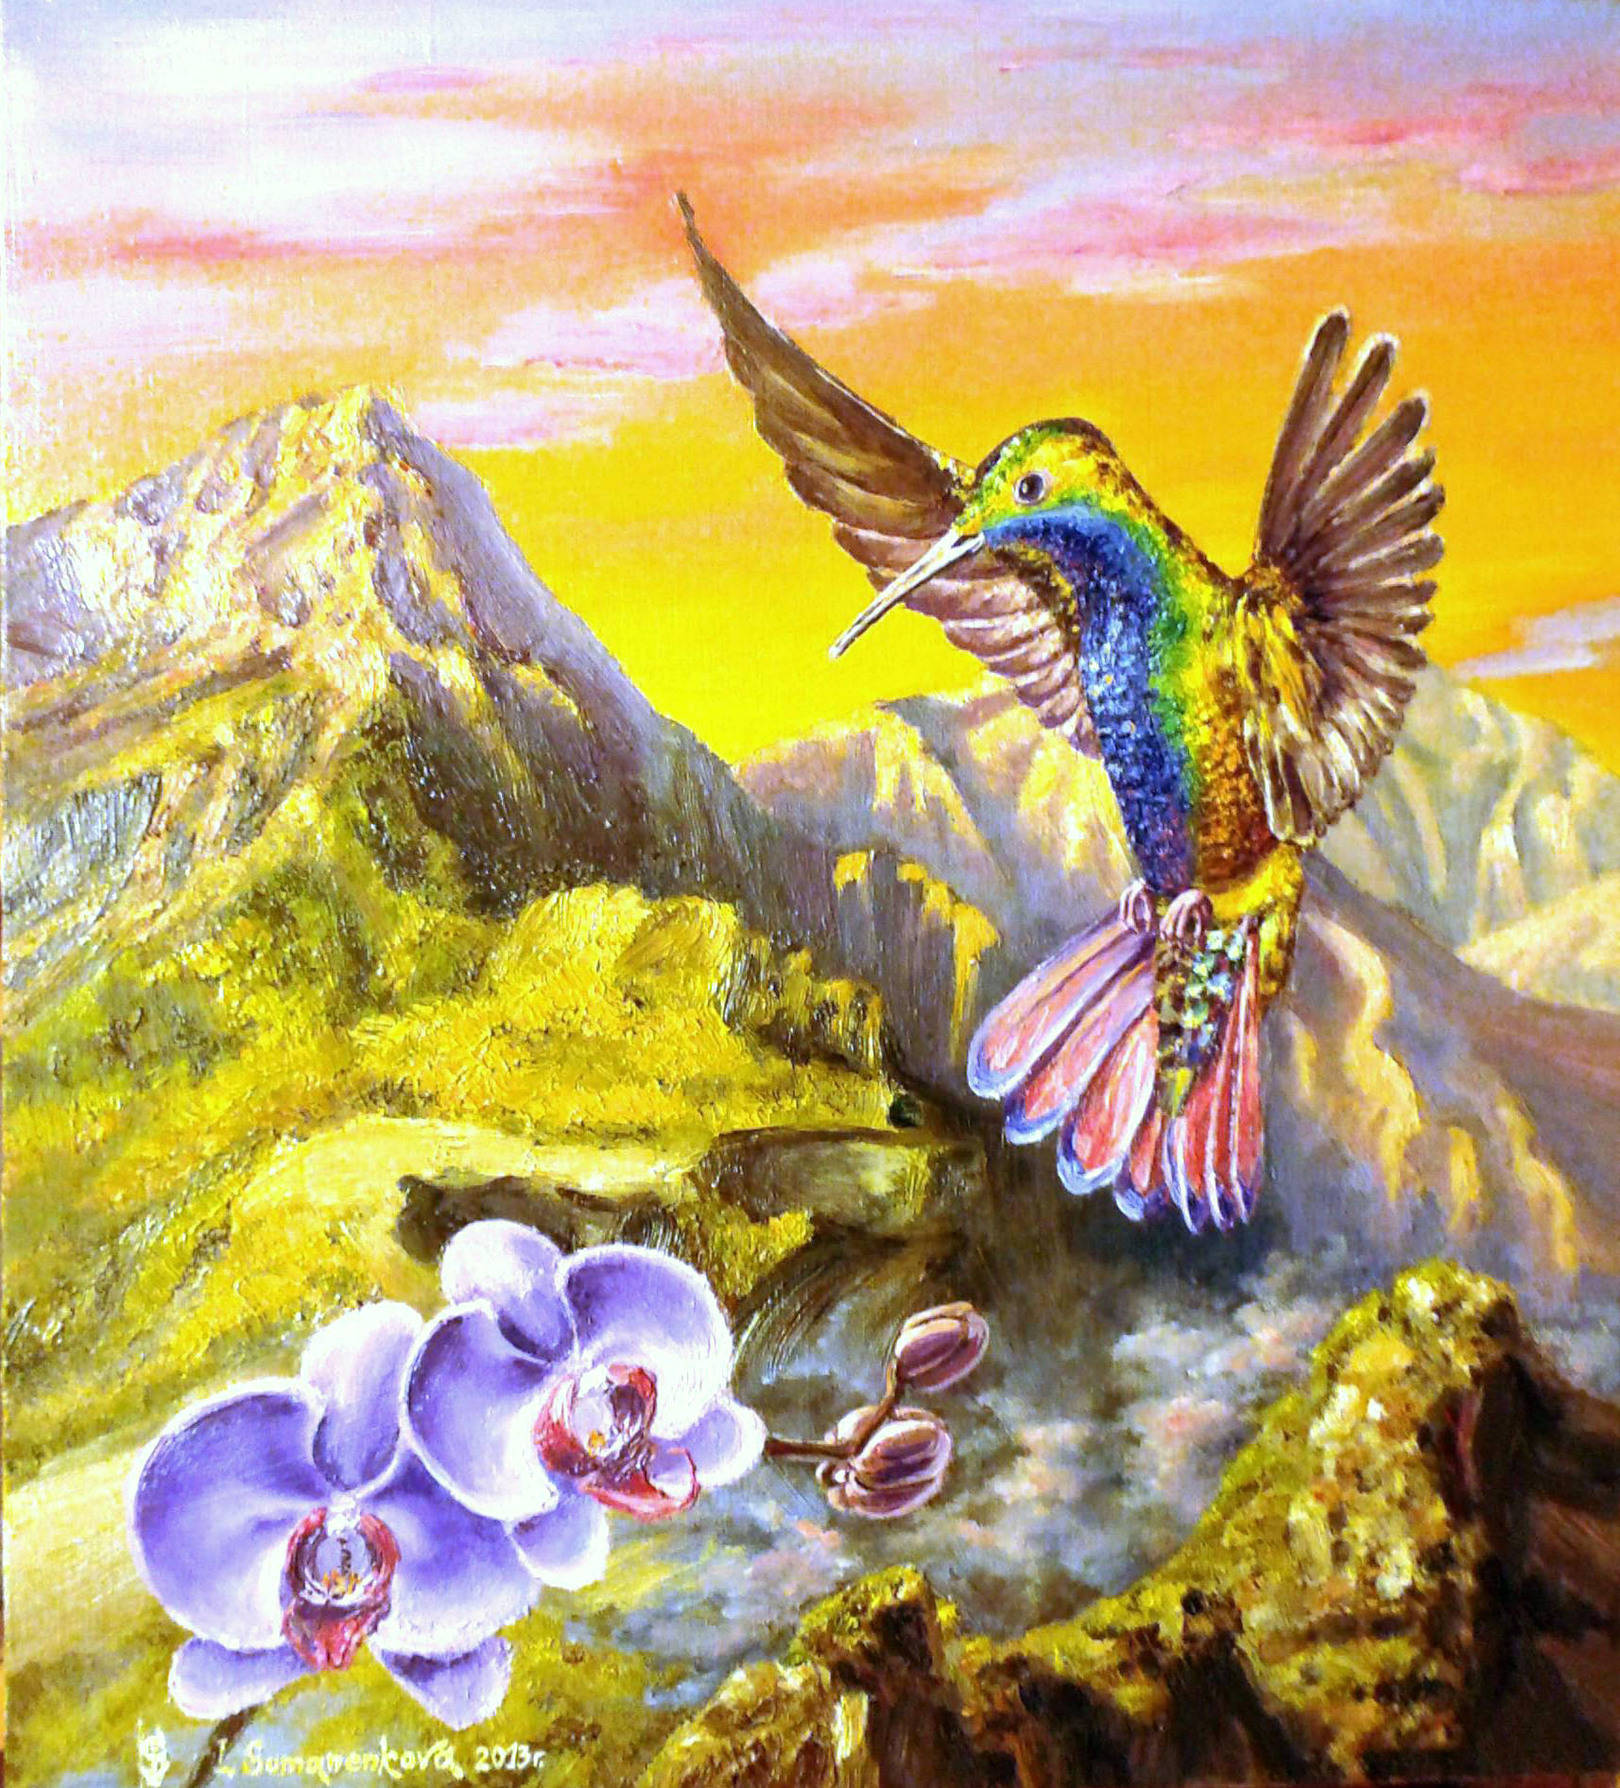 В золте Перу блистает изумруд живой! / In a gold of Peru shines the emerald alive! 45 x 45 cм, холст, масло, 2013 г